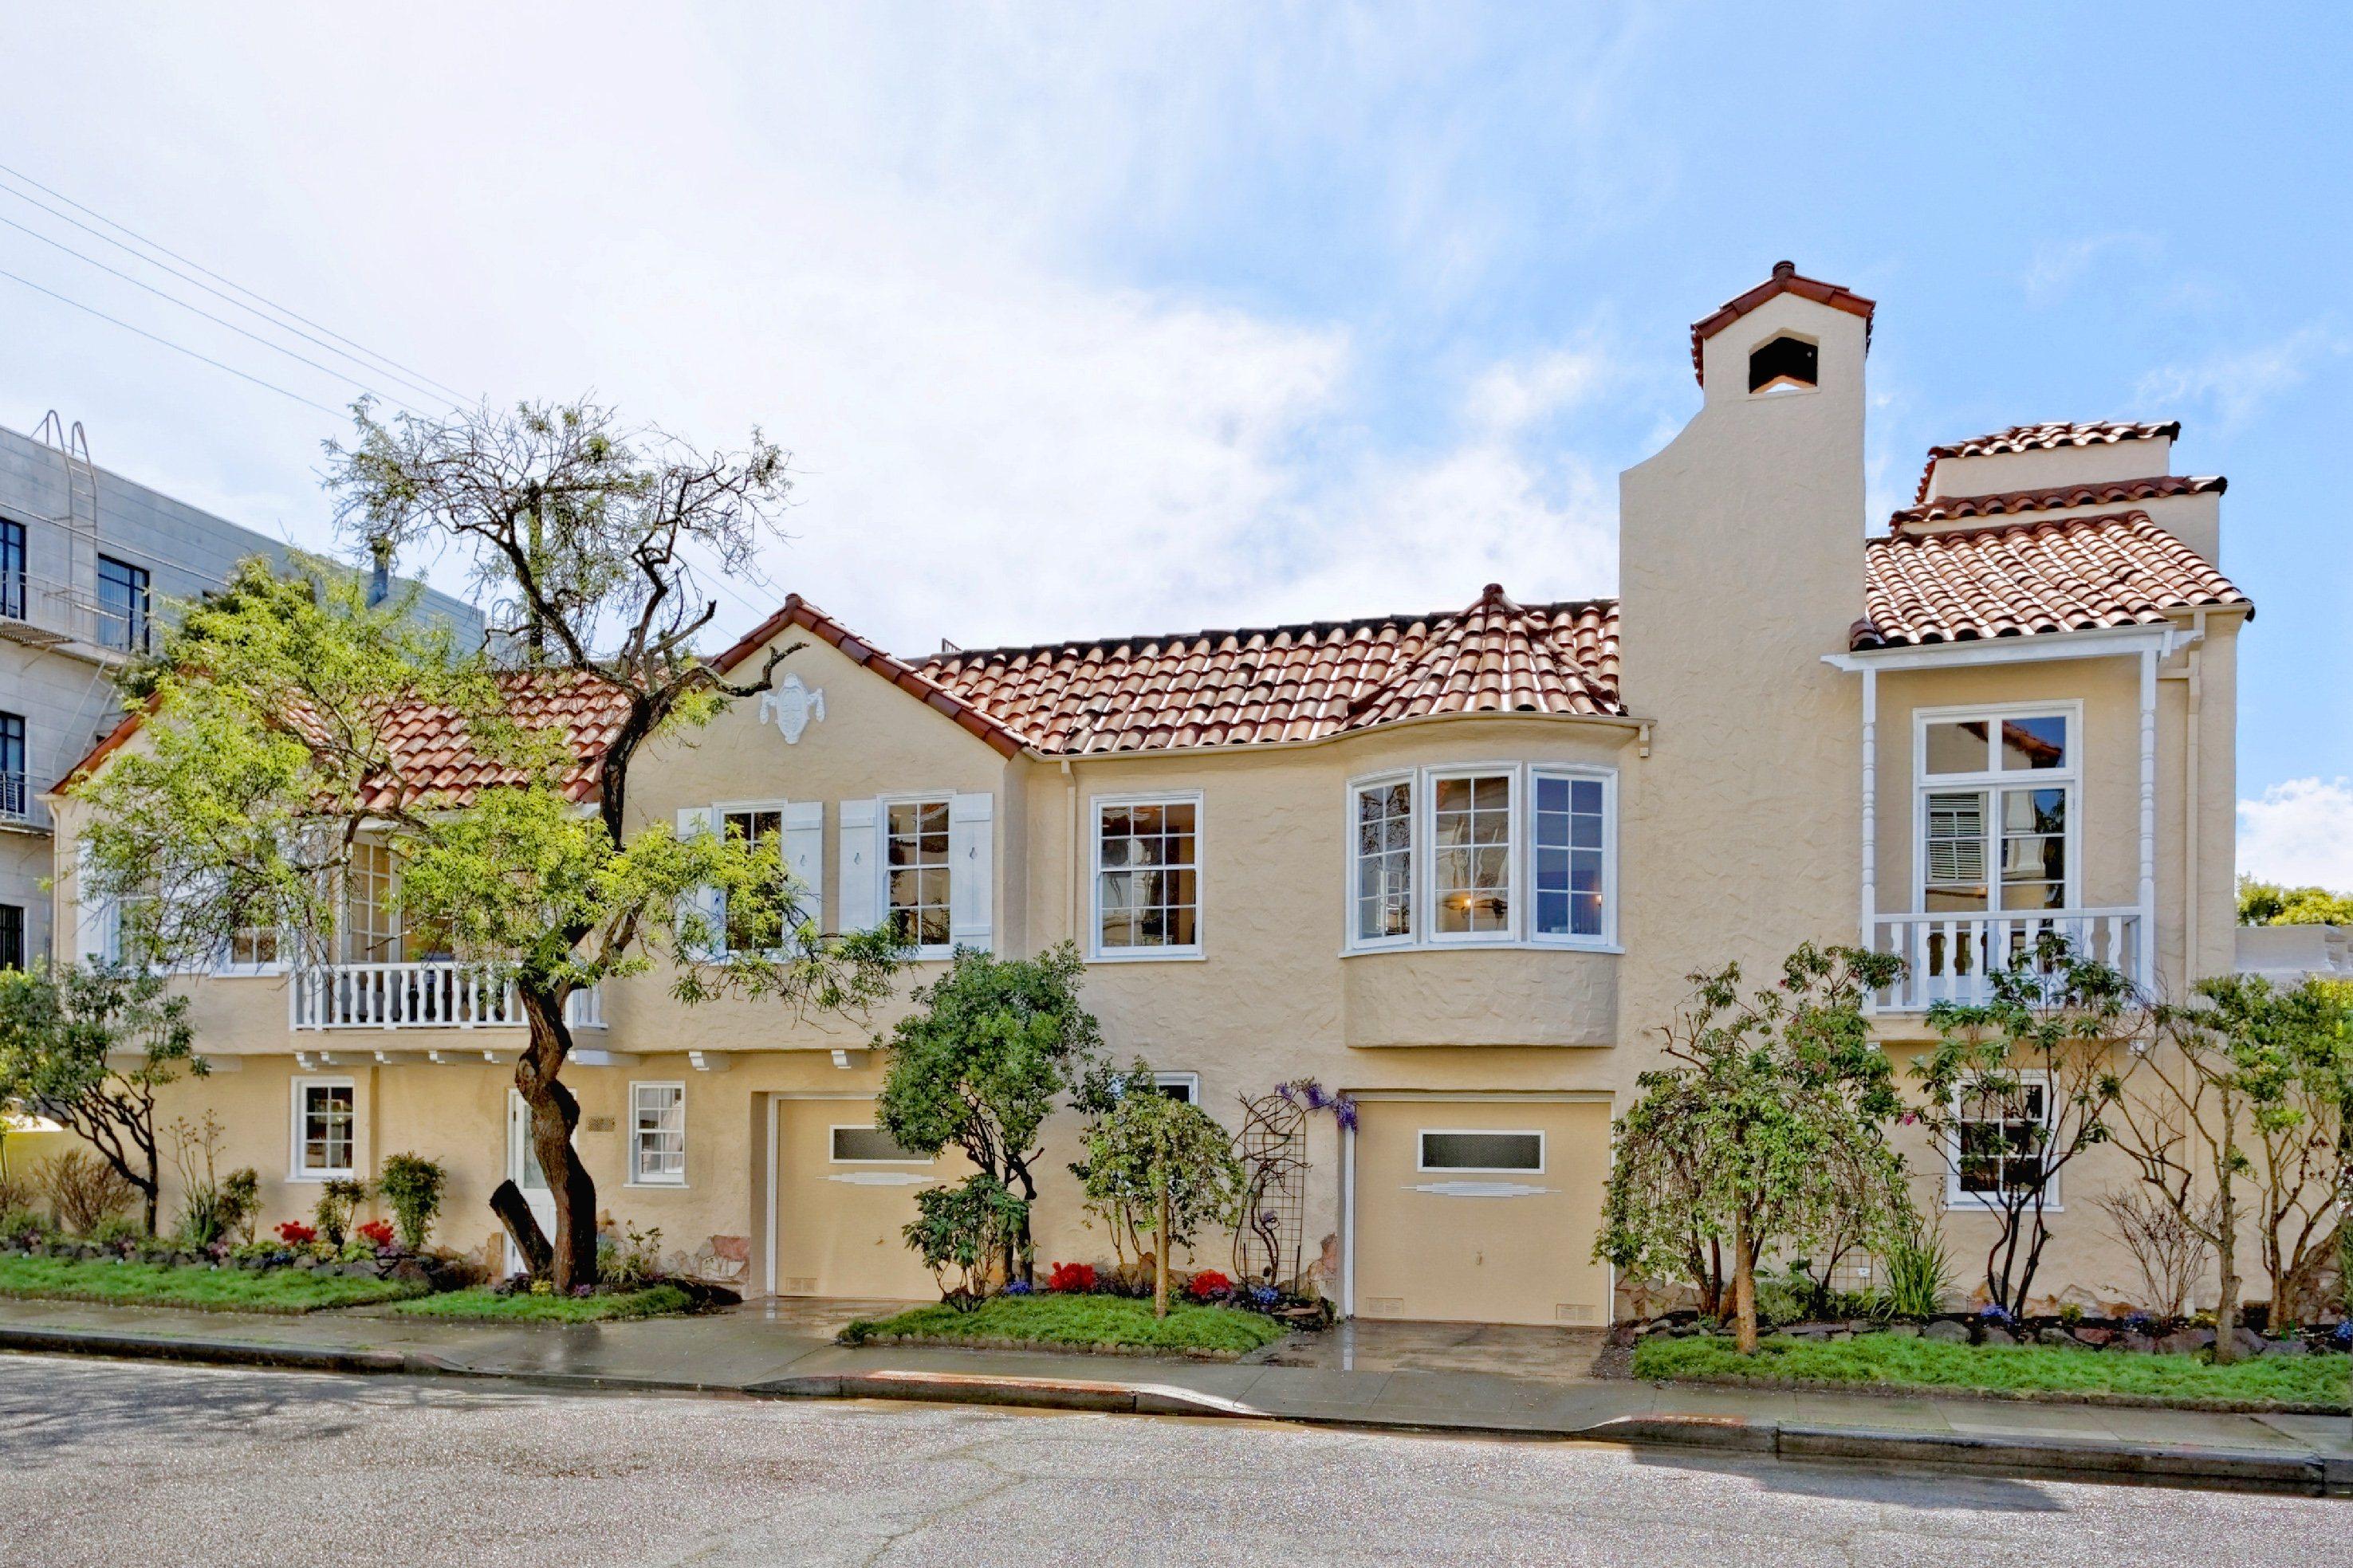 Robert R. Callan Jr. - McGuire Real Estate image 9